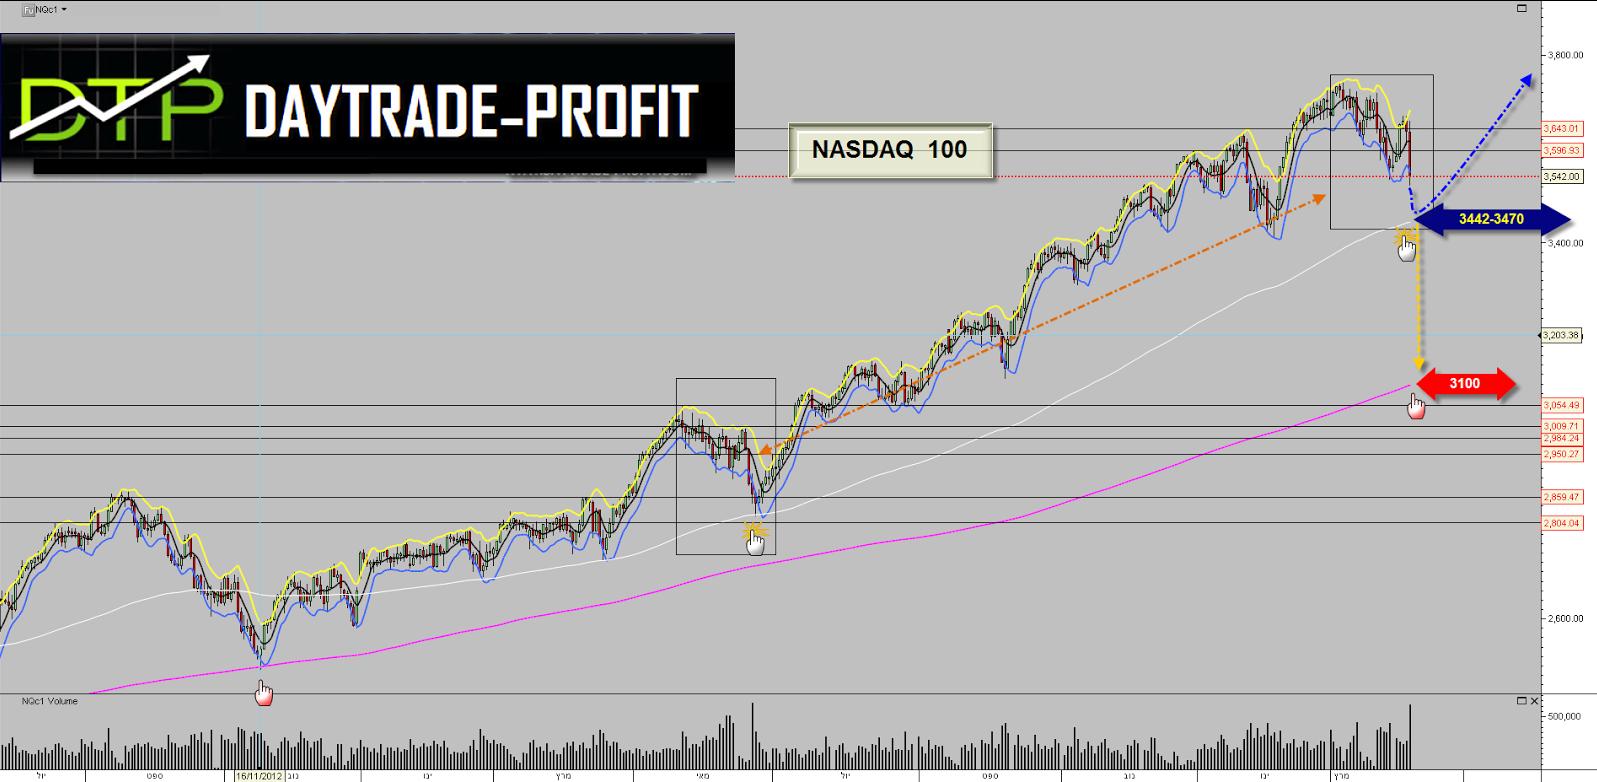 Nasdaq 400 Daily Chart